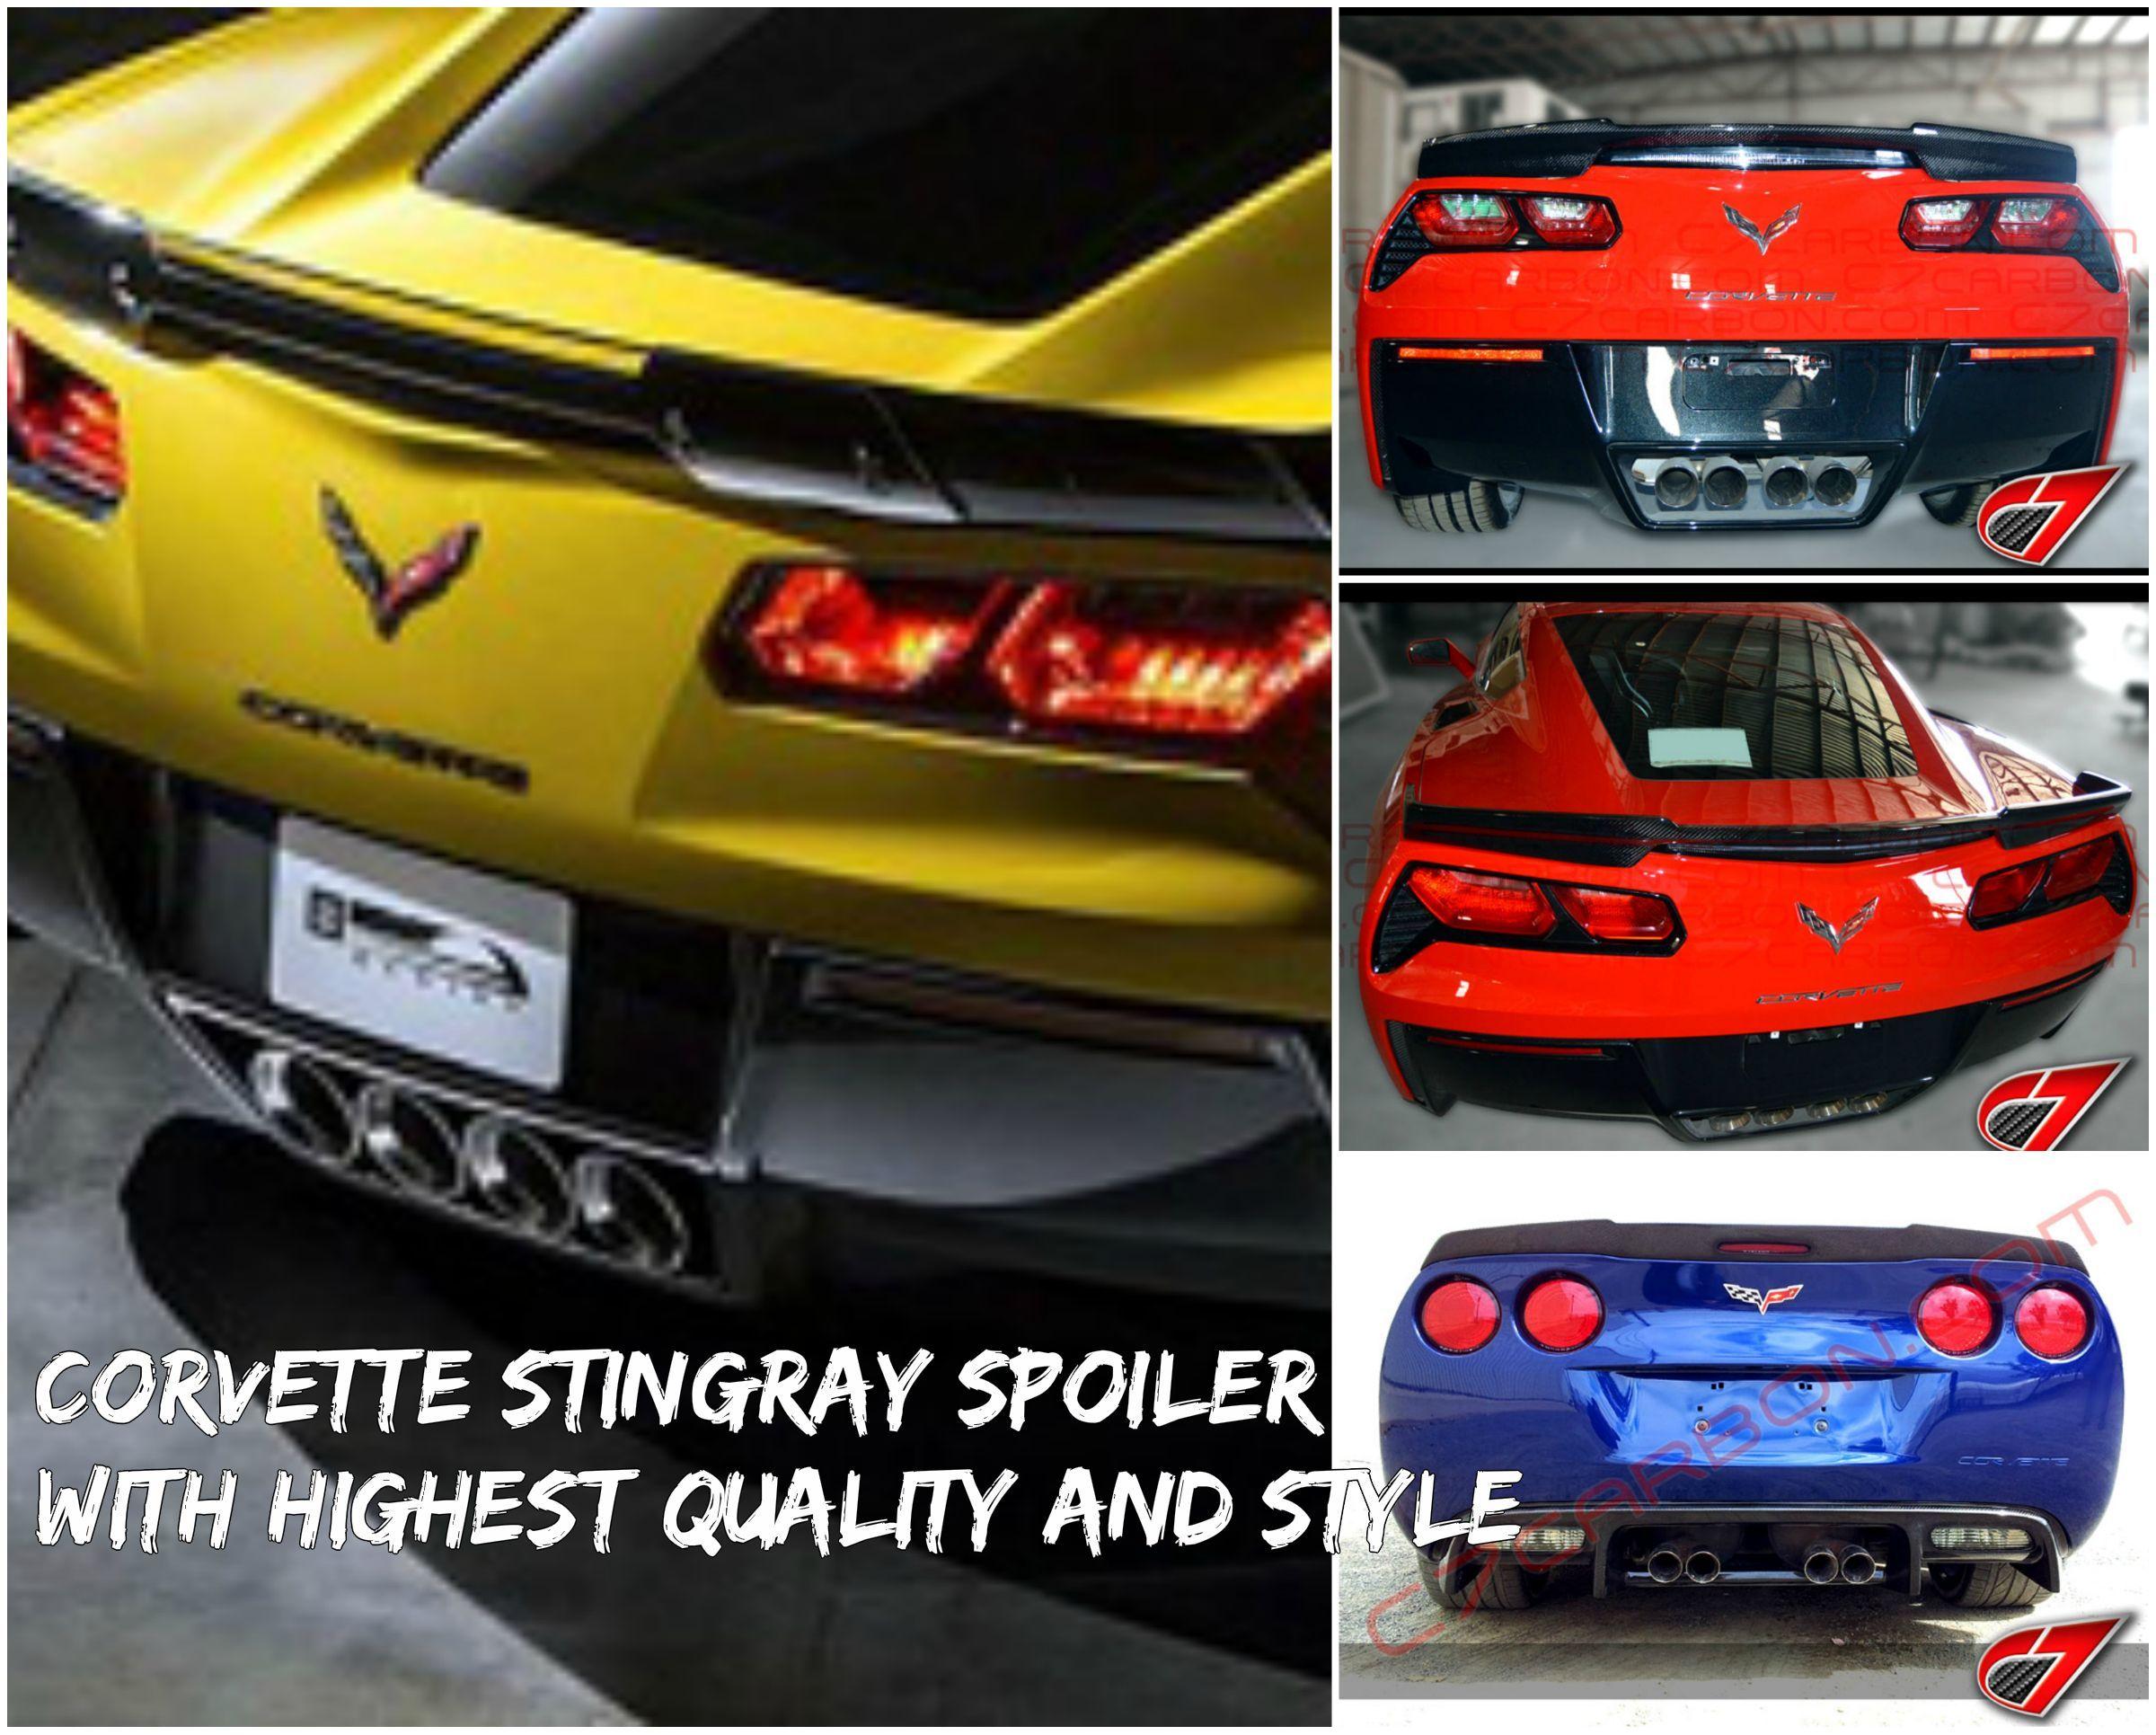 Corvette Stingray Spoiler And Corvette Stingray Carbon Fiber Parts Are Lightweight Strong And Very Durable Increa Corvette Stingray Corvette Mitsubishi 3000gt